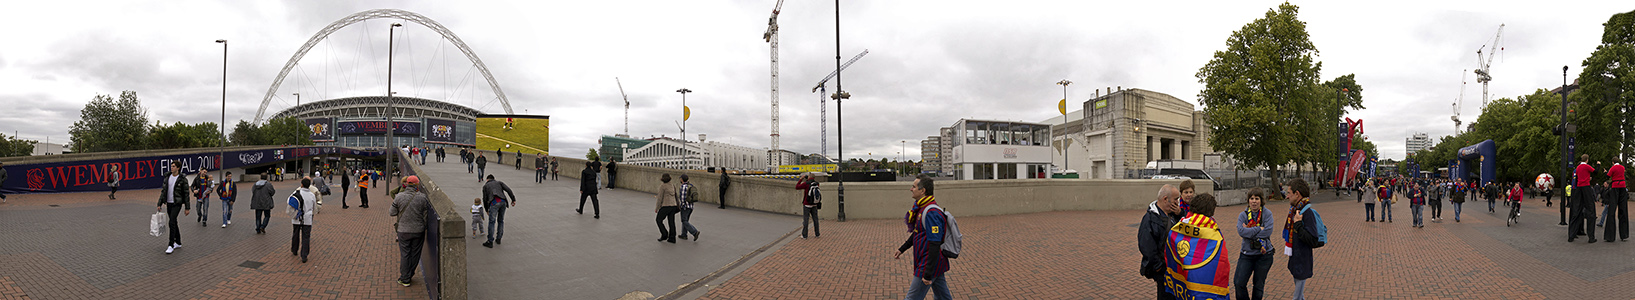 London Wembley Park: Wembley-Stadion (Wembley Stadium), Olympic Way (Wembley Way)